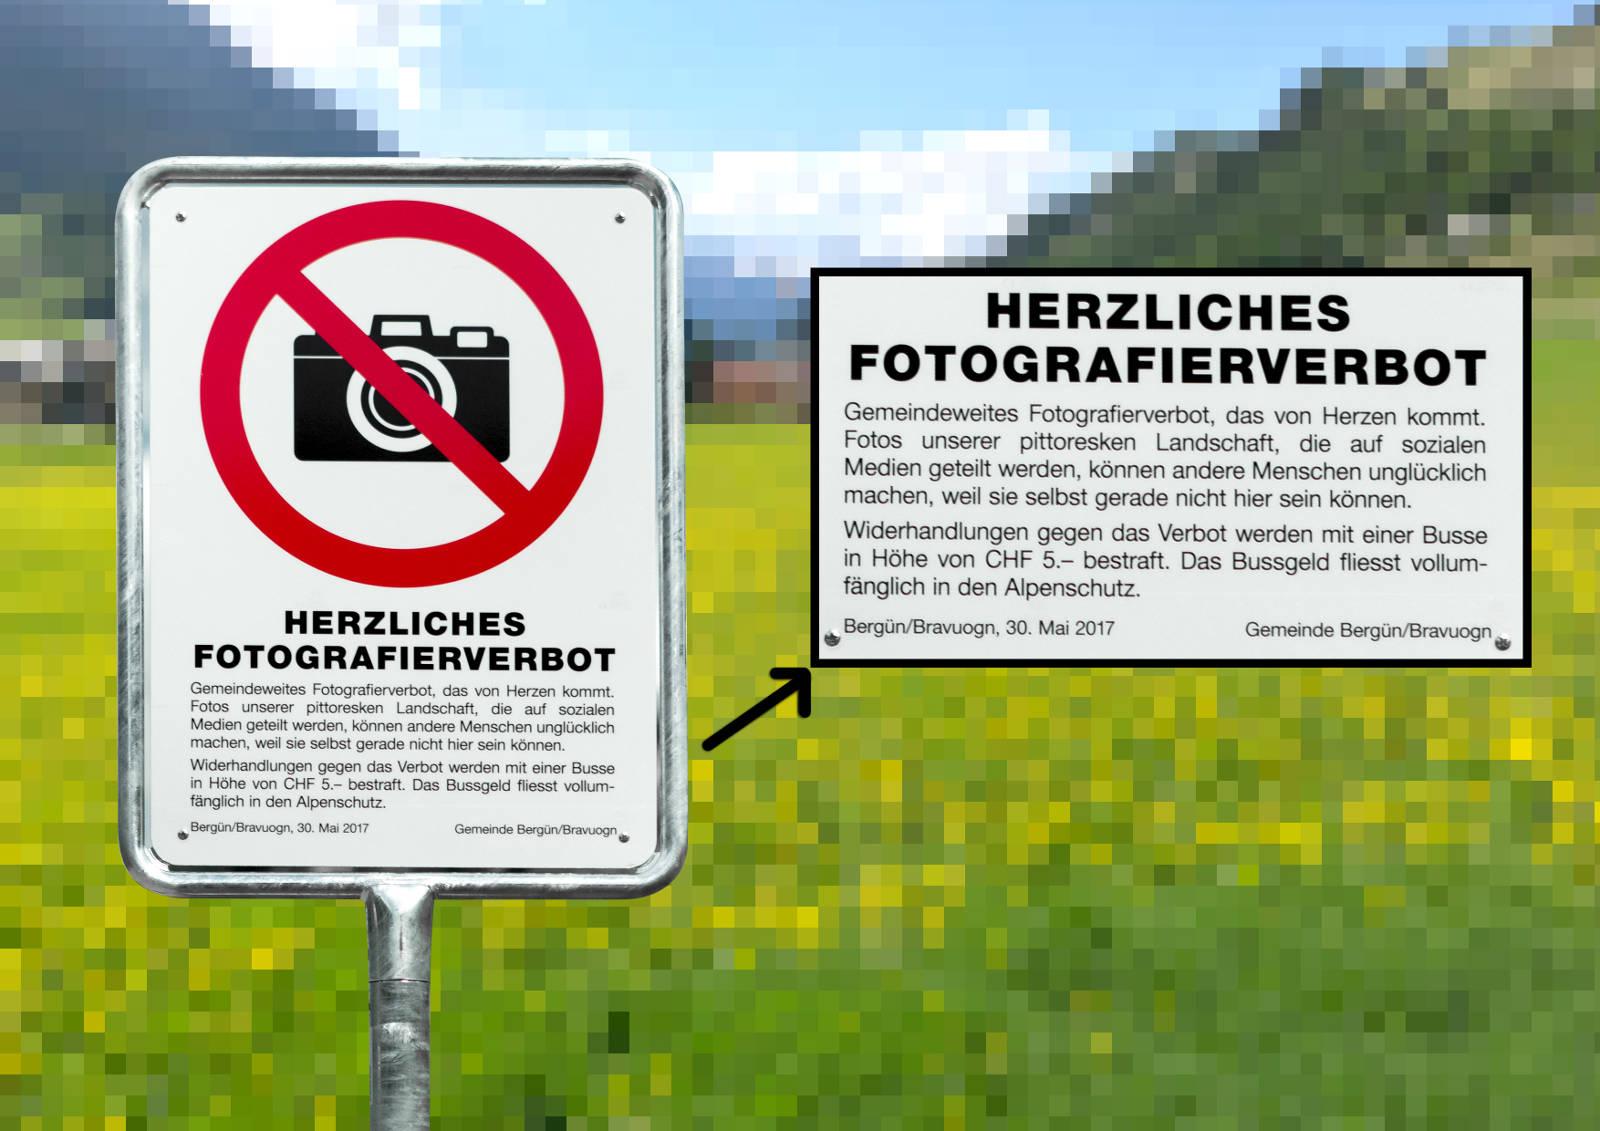 Fotoverbot in Bergün